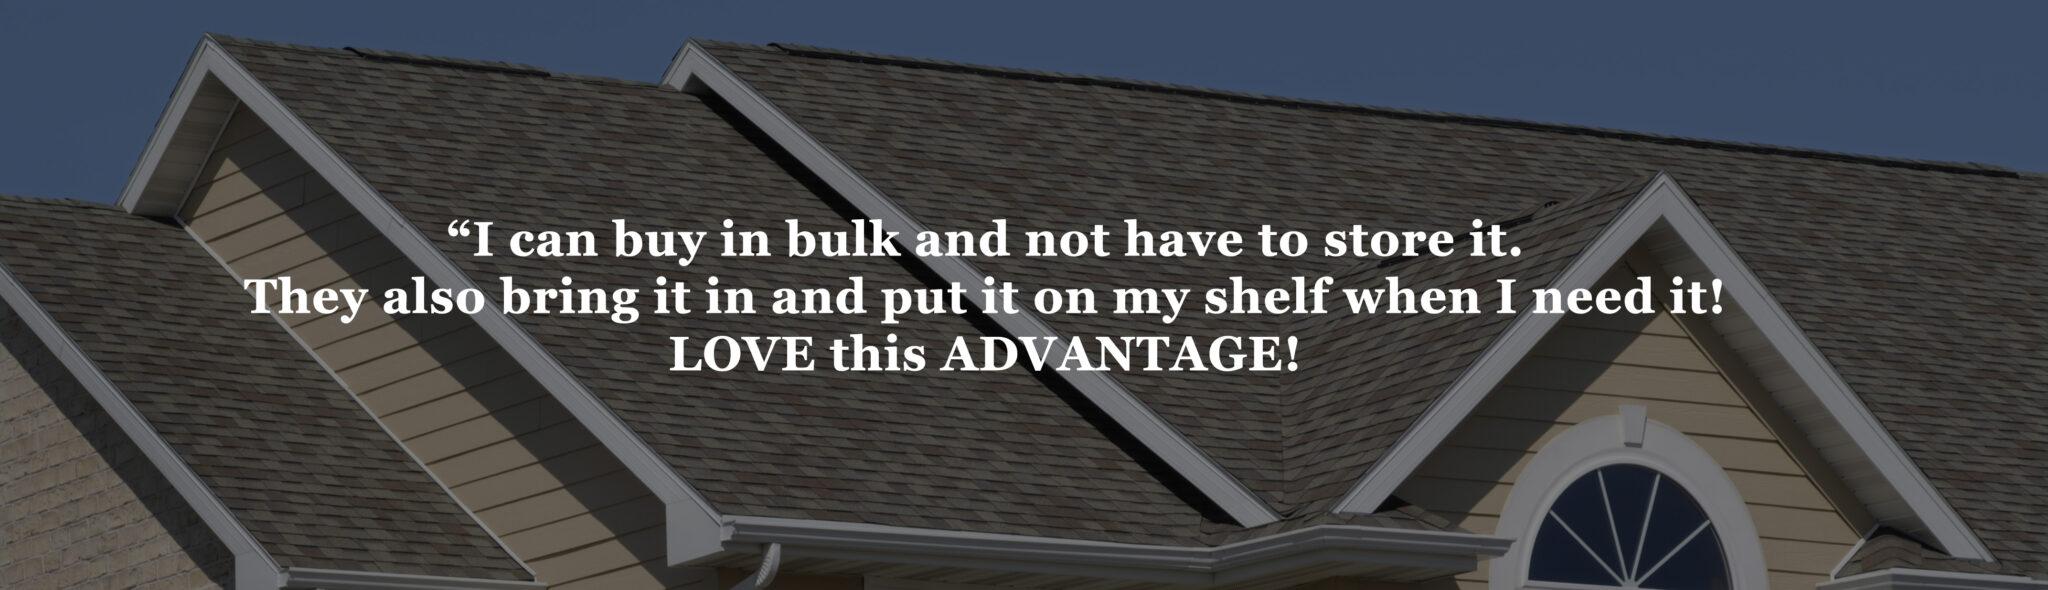 New Residential House; Architectural Asphalt Shingle Roof, Vinyl Siding